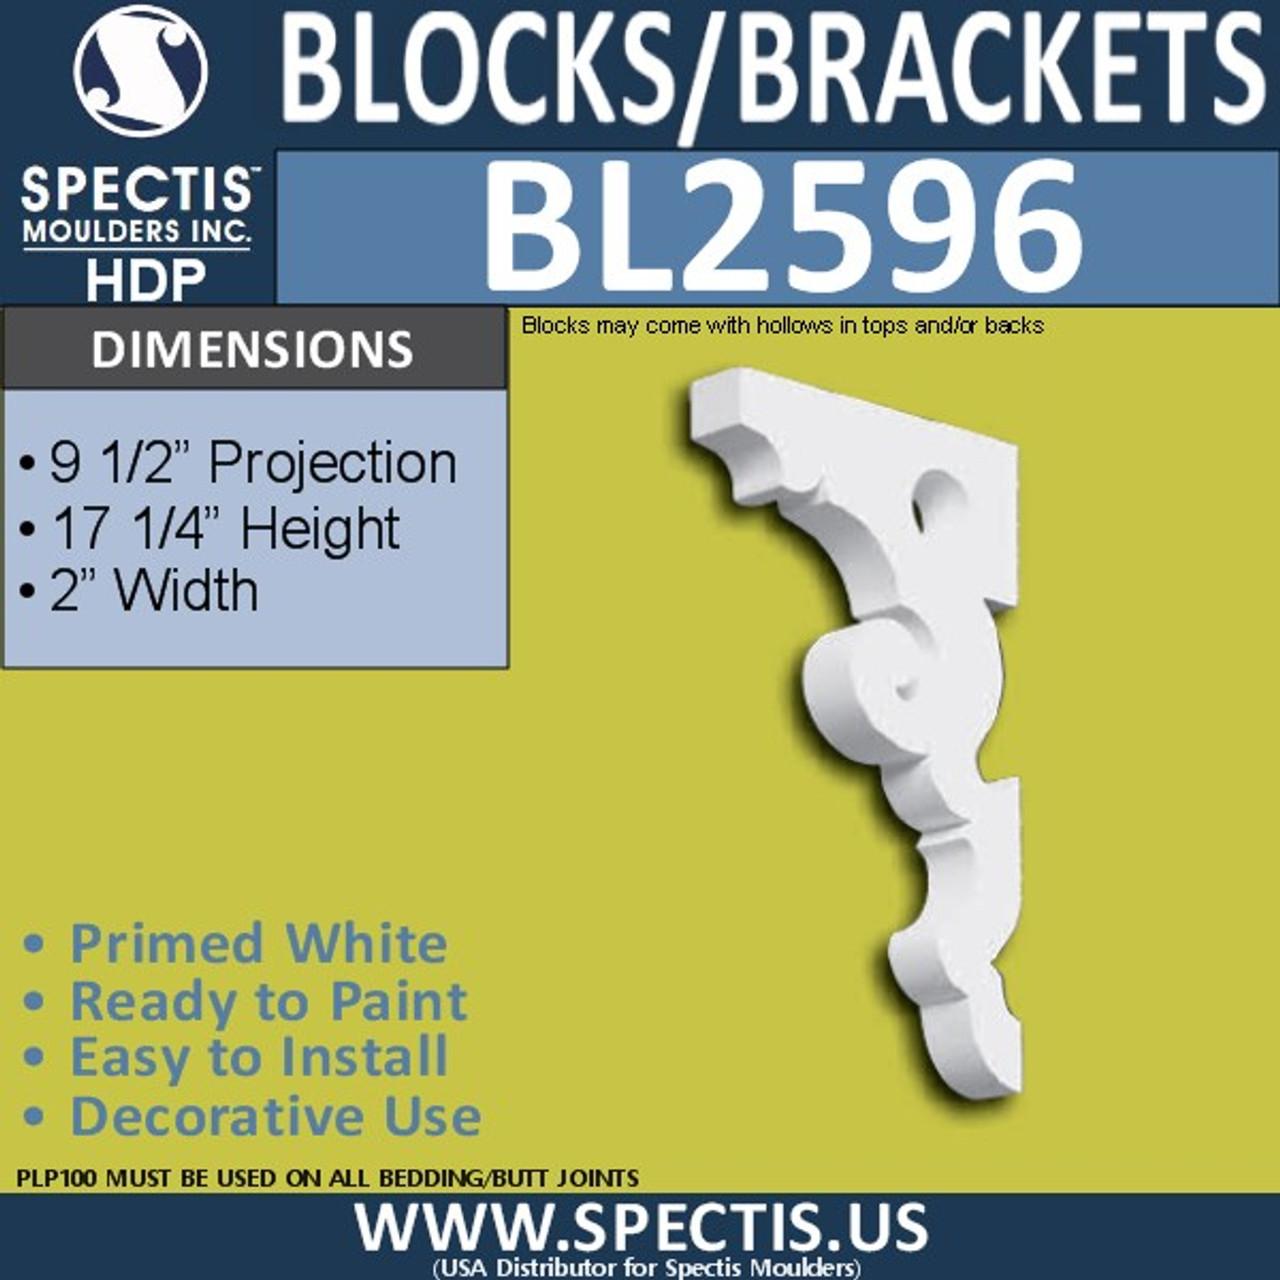 "BL2596 Eave Block or Bracket 2""W x 17.25""H x 9.5"" P"